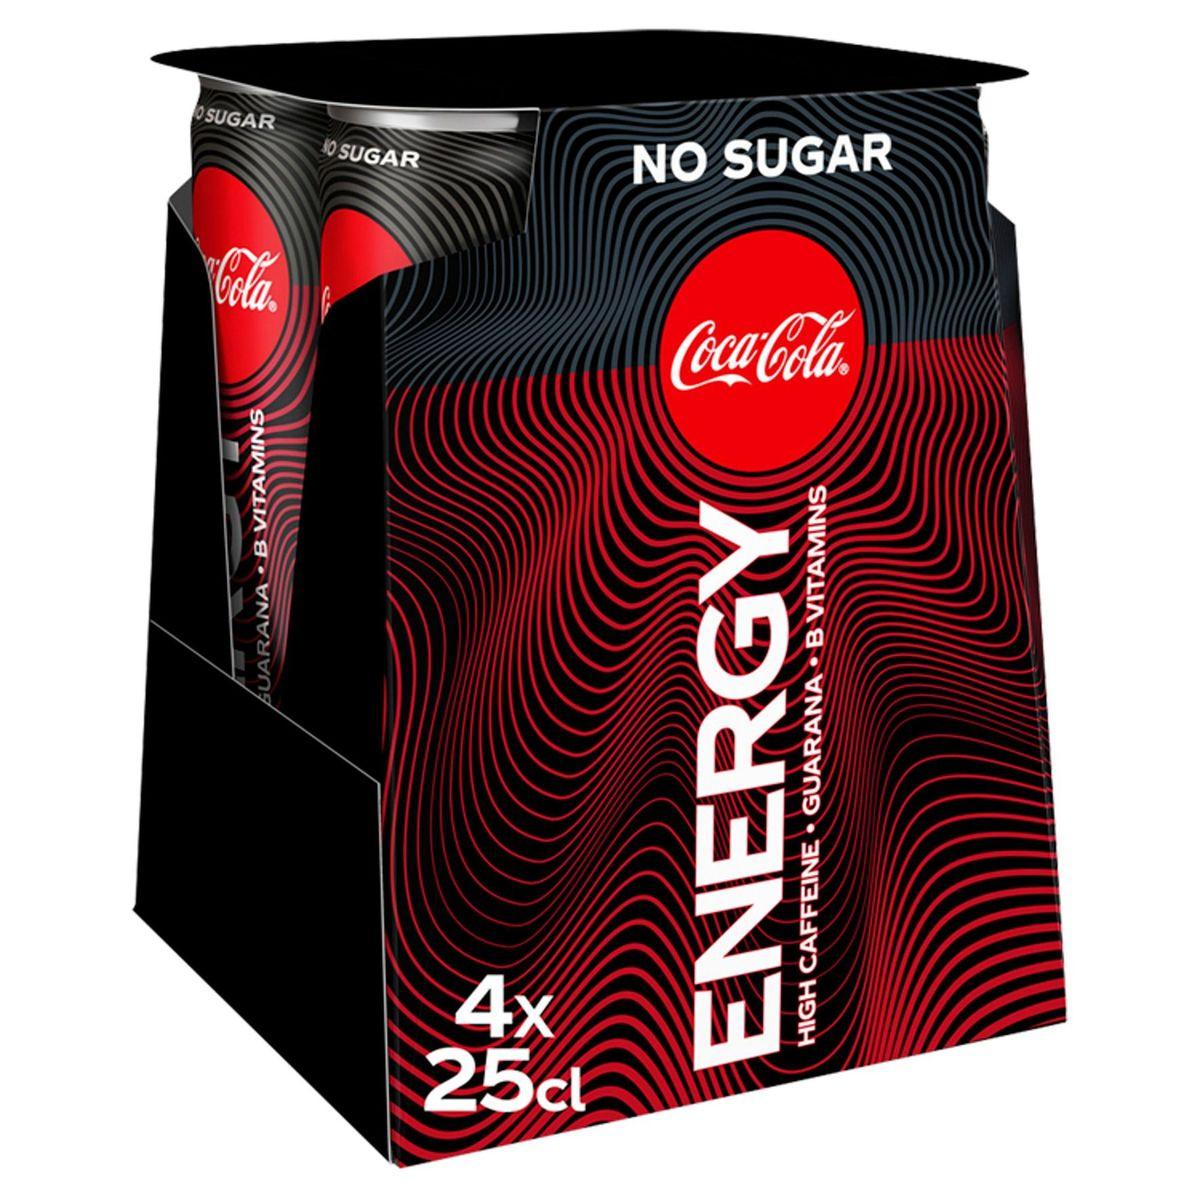 Coca-Cola Energy No Sugar Canette 4x250ml